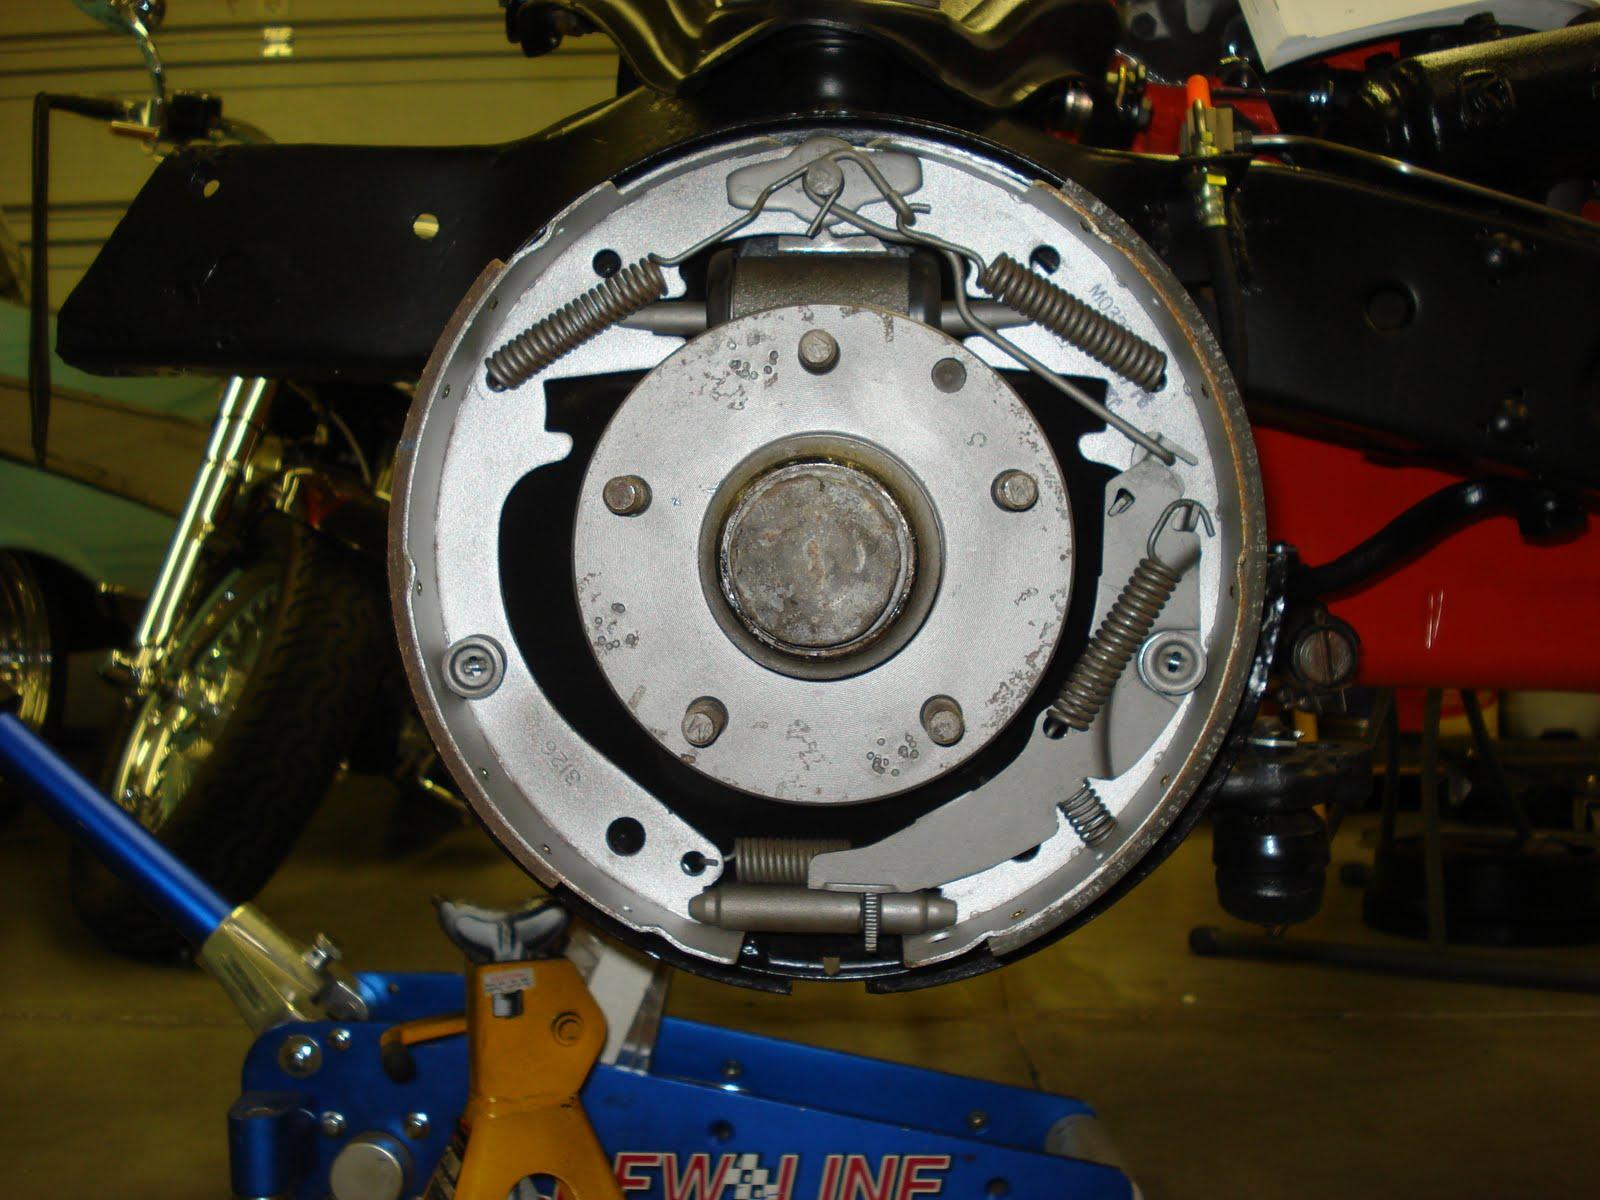 chevy drum brakes diagram volume control switch wiring service manual 1973 chevrolet corvette brake